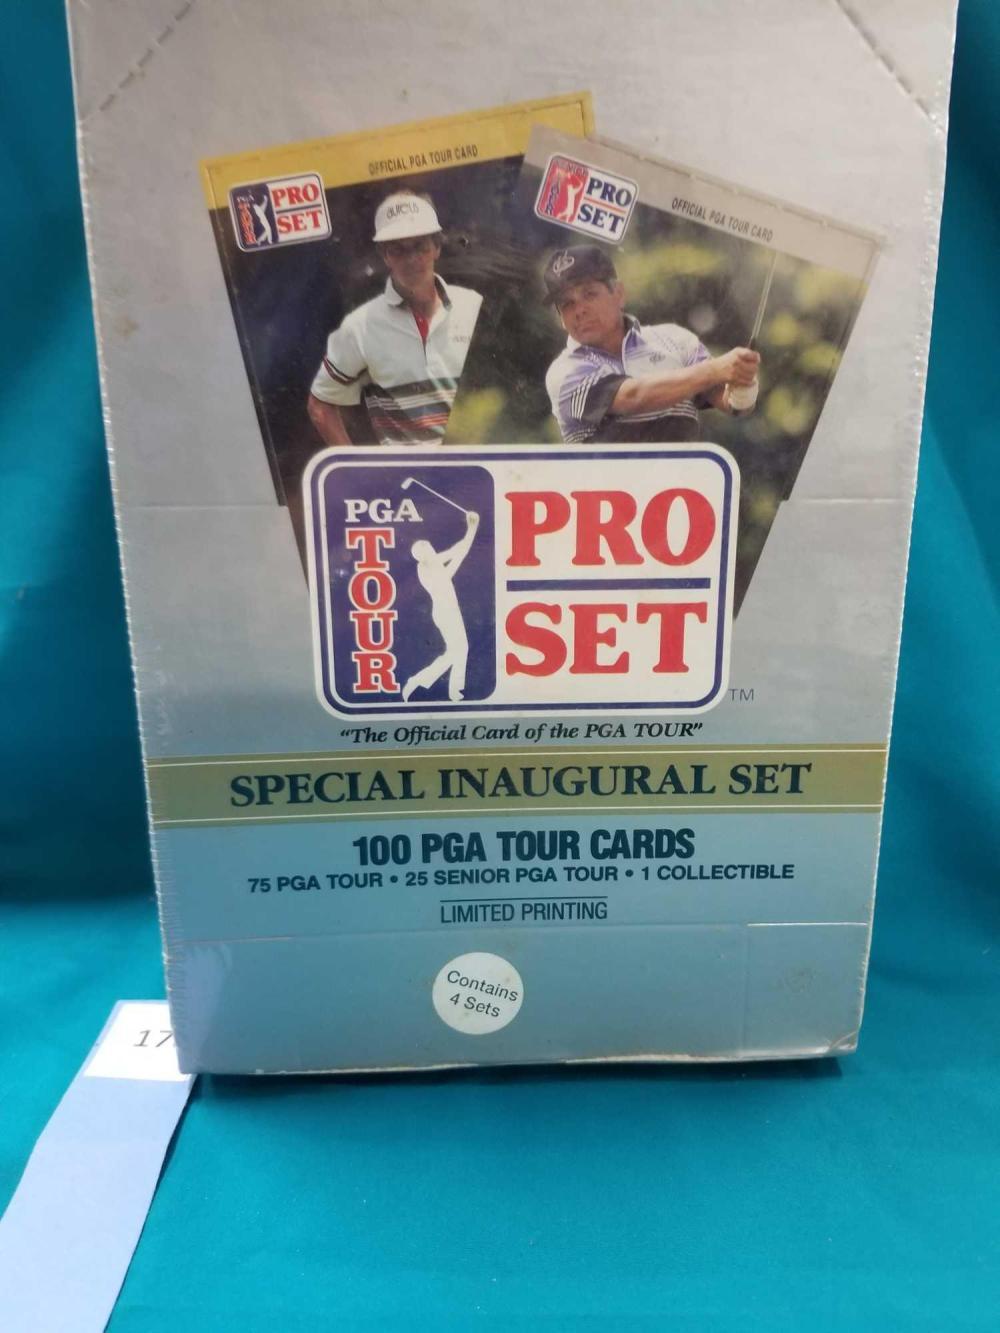 PGA TOUR PRO CARD SET - SPECIAL INAUGURAL SET